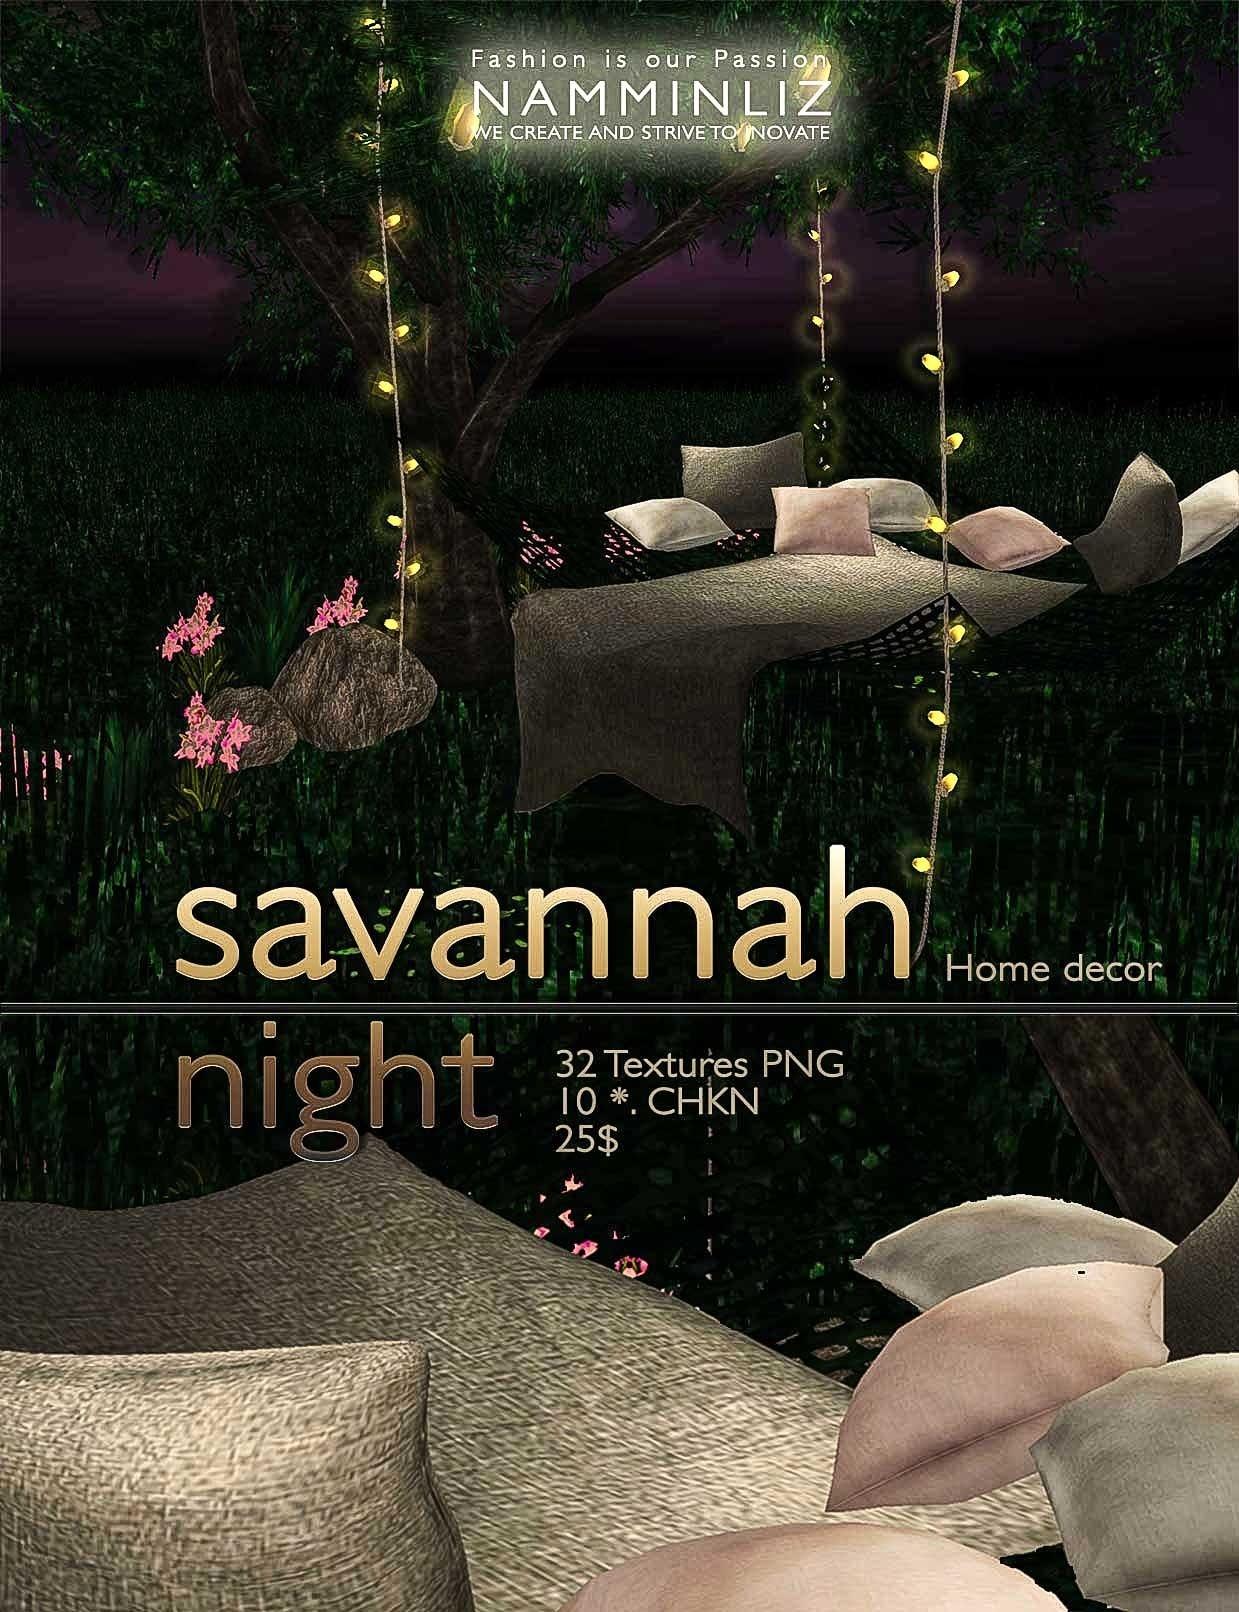 Savannah Night imvu Home decor •28 Textures PNG  •10 *.CHKN NAMMINLIZ